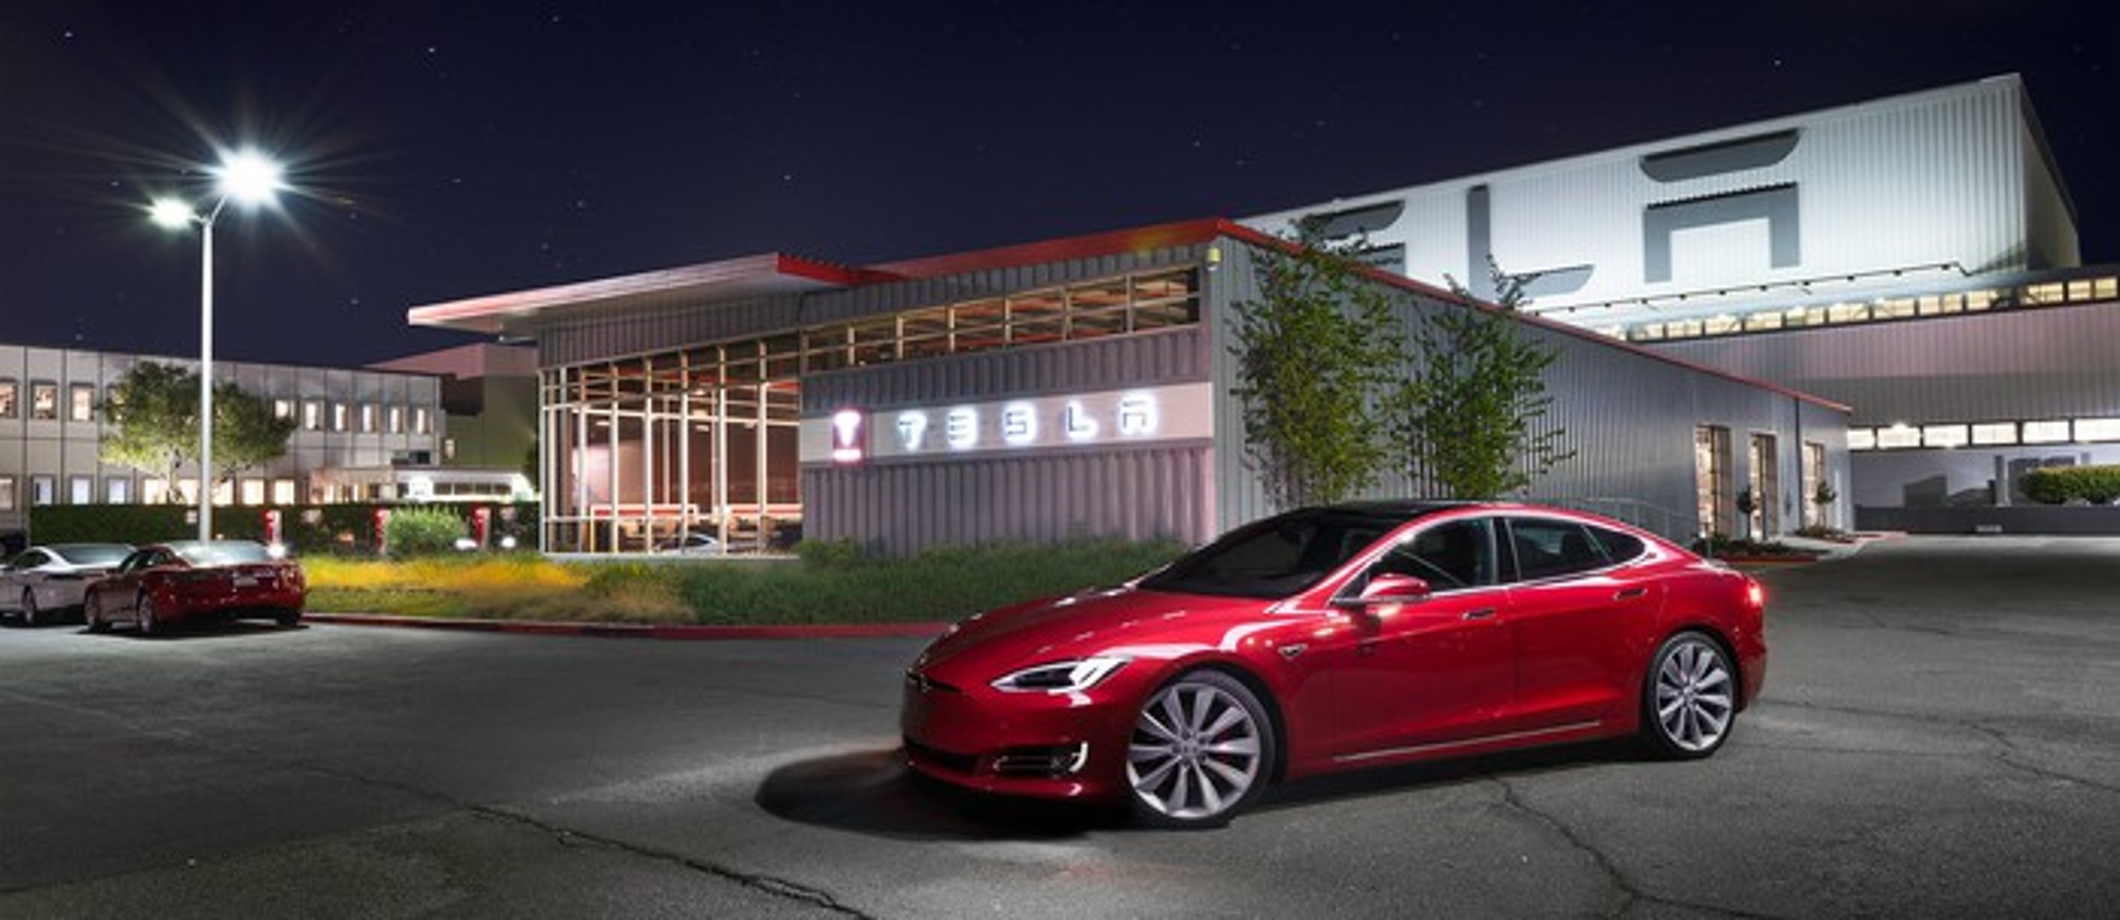 Model S parked outside Tesla's Fremont factory